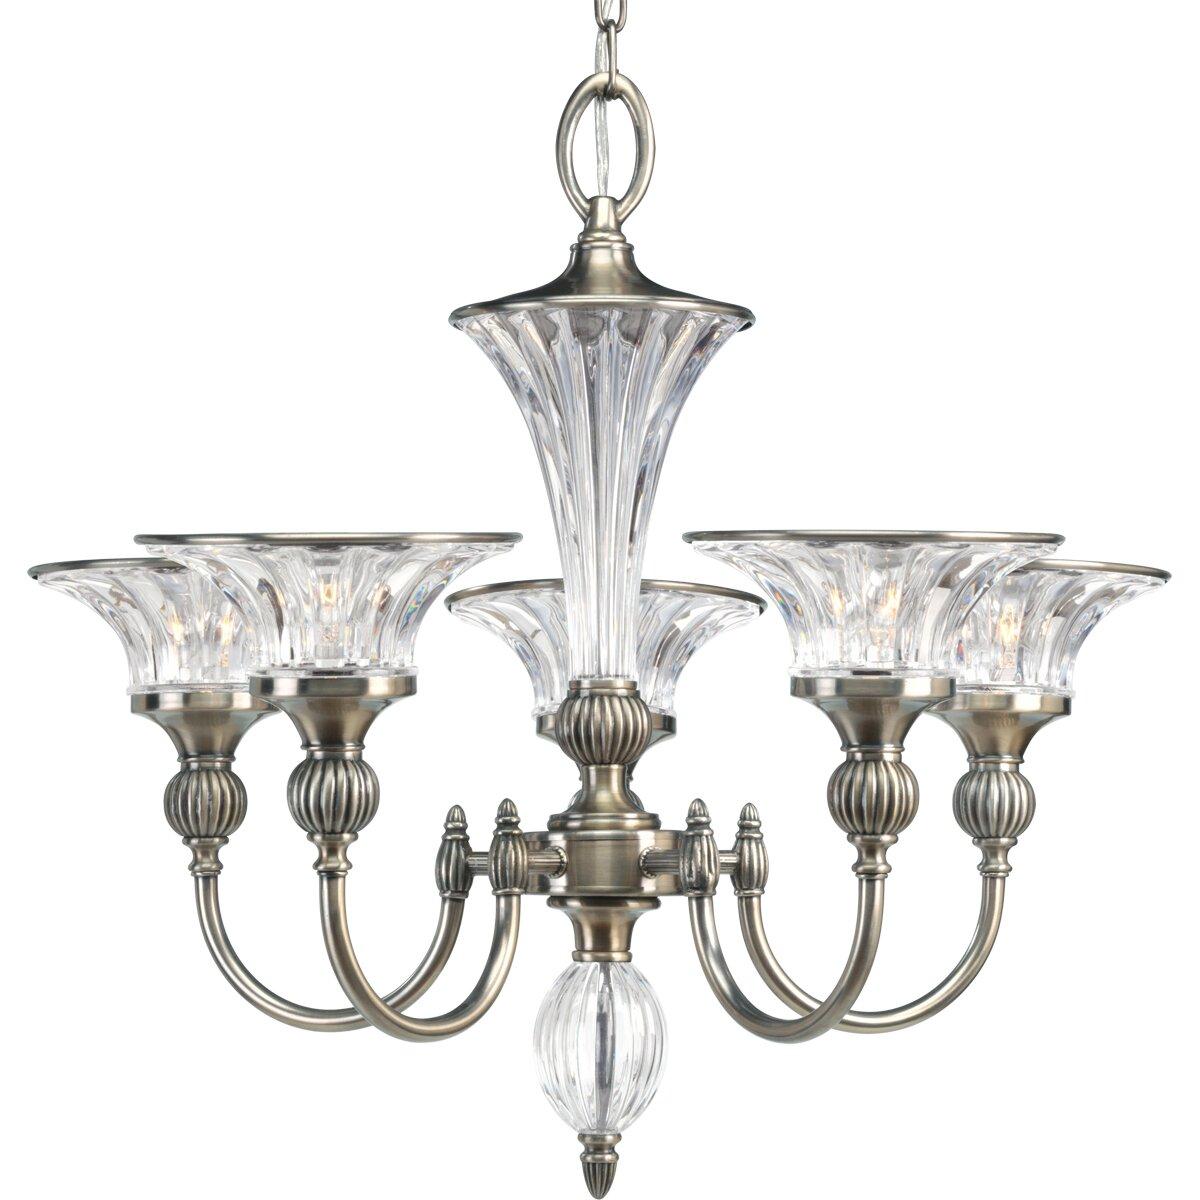 Progress lighting roxbury 5 light chandelier reviews for Thomasville lights